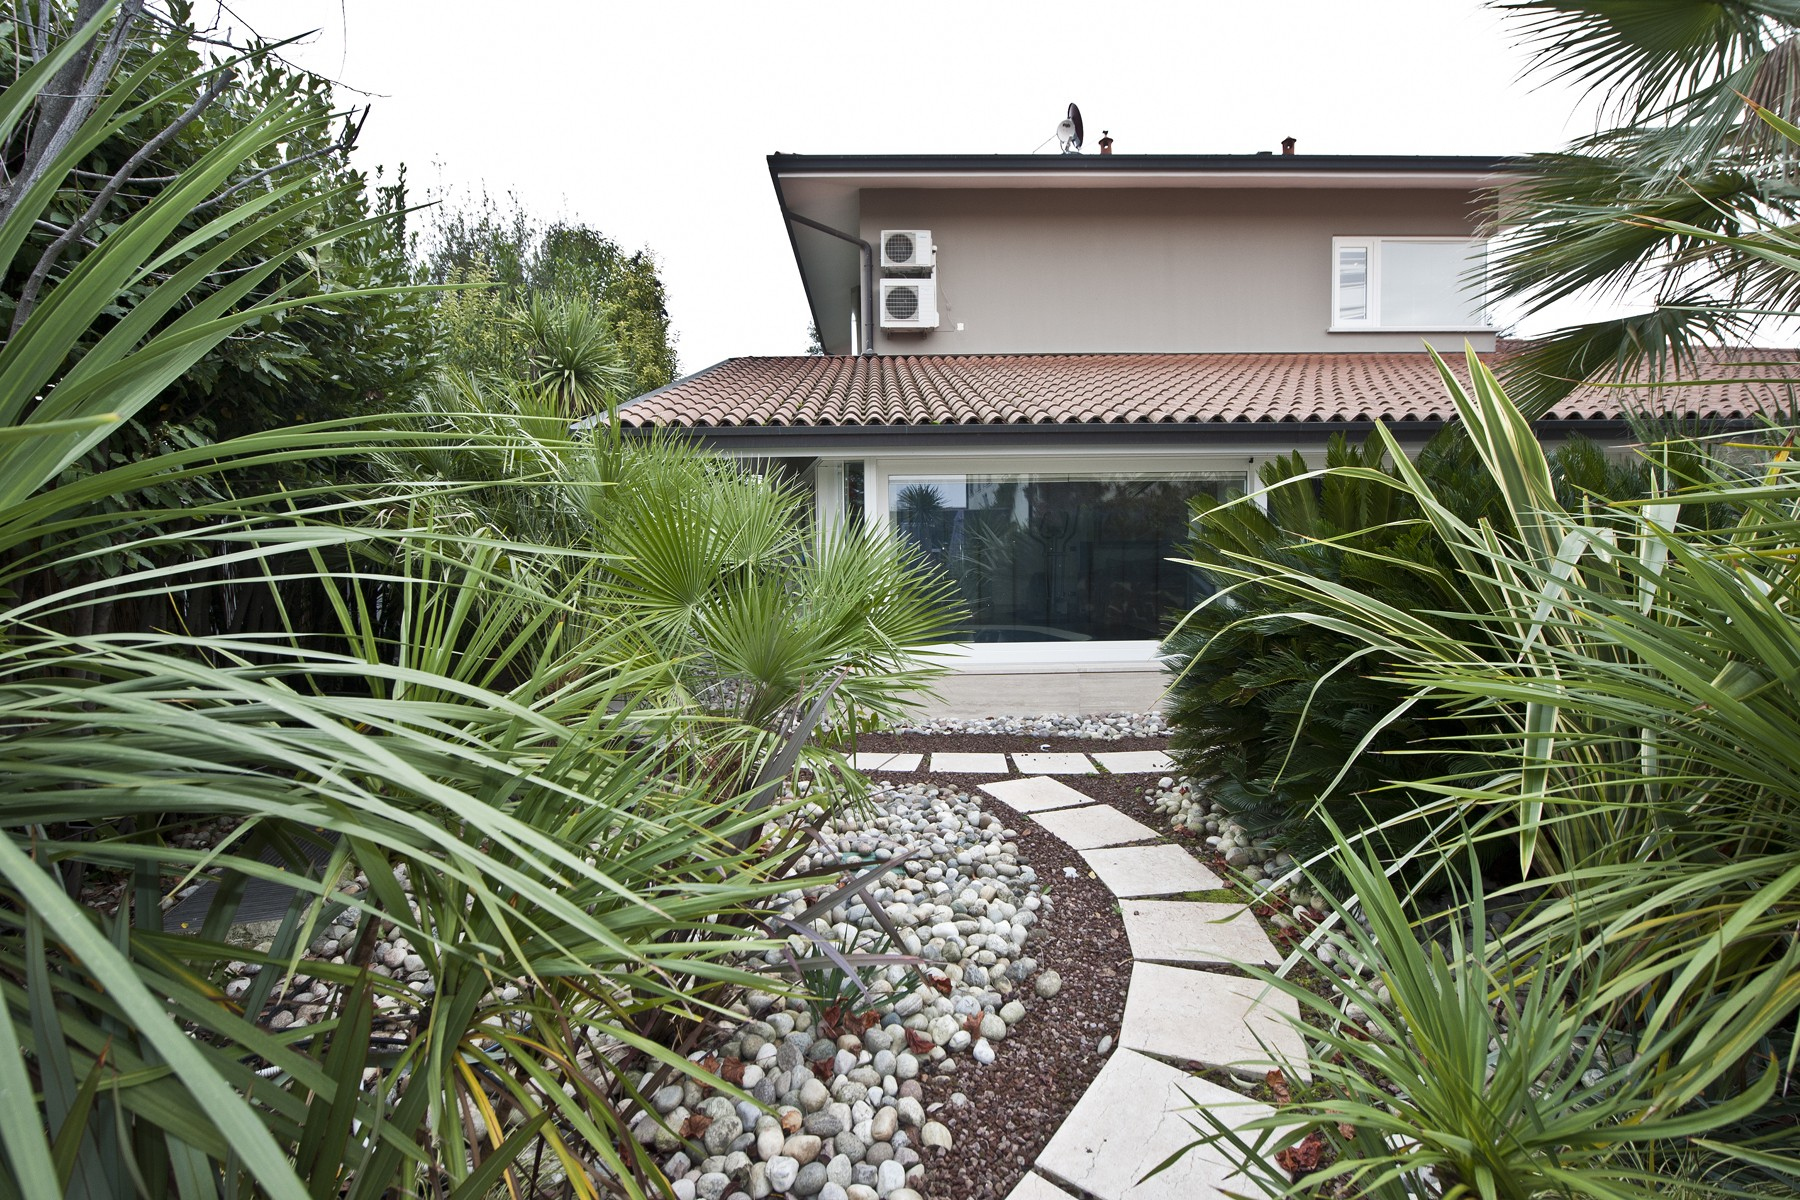 Villa in Vendita a Sirmione: 5 locali, 500 mq - Foto 20